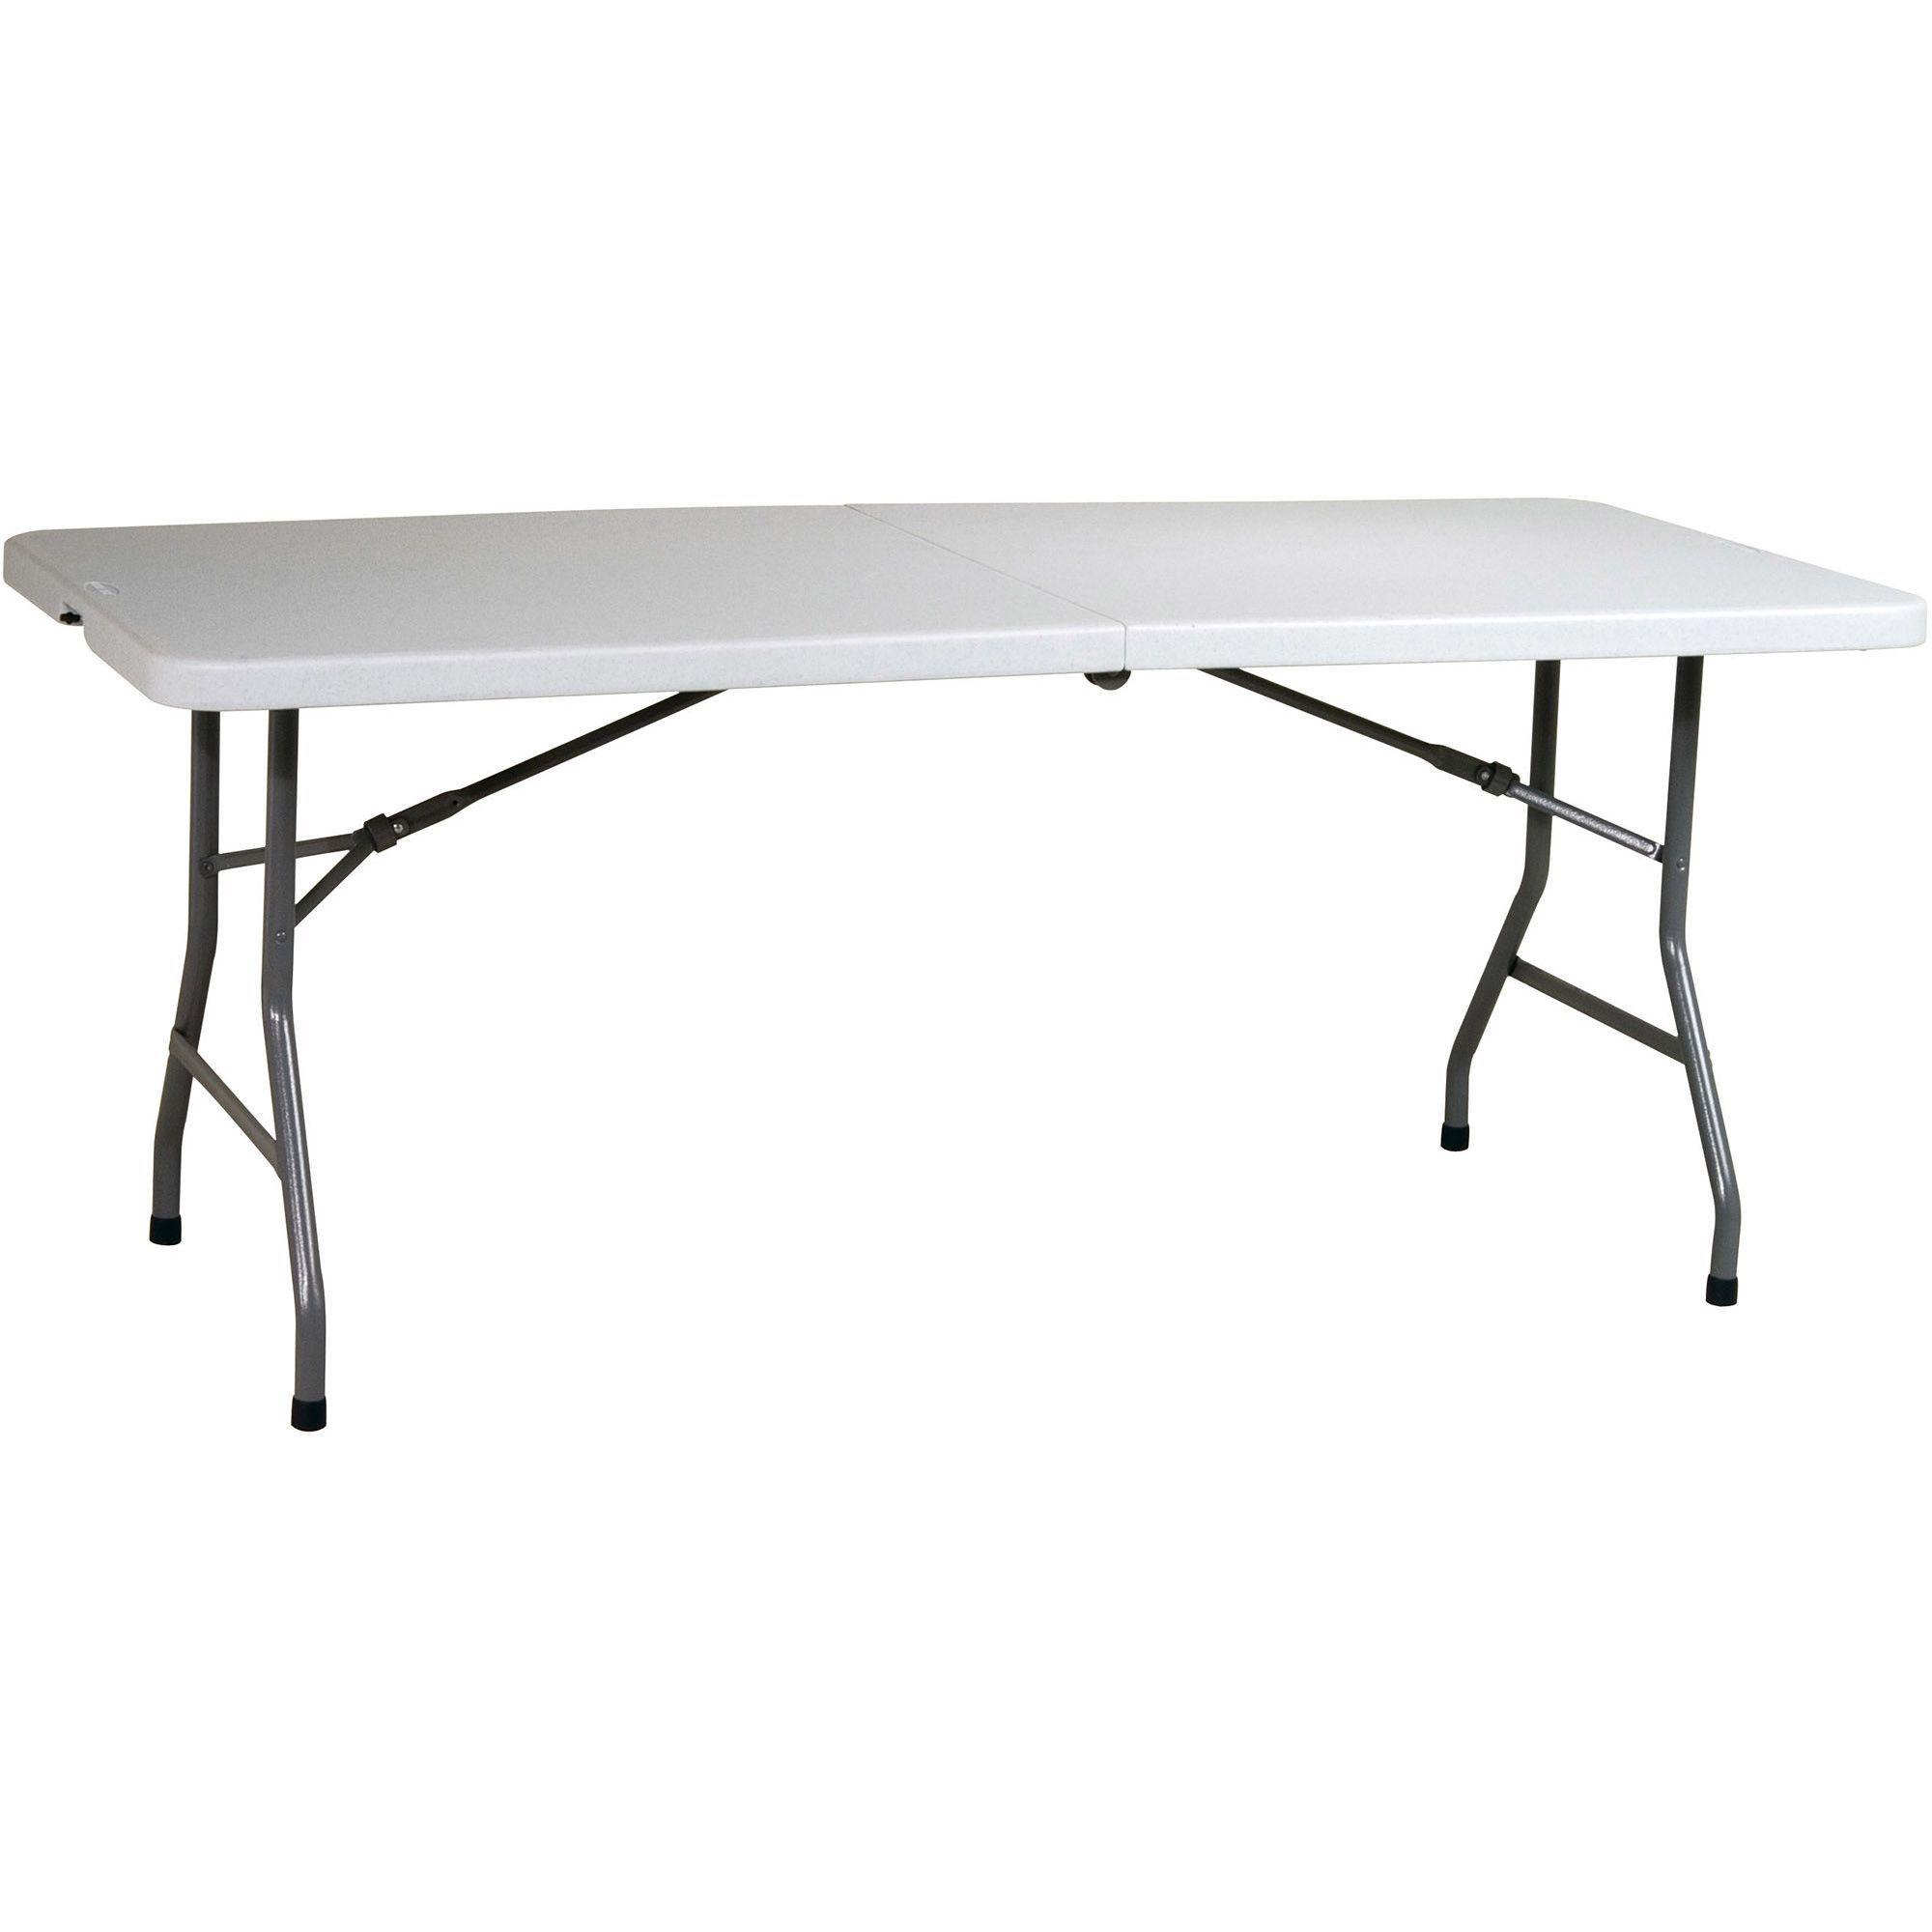 Work Smart Resin 6 Folding Multipurpose Table Light Grey With